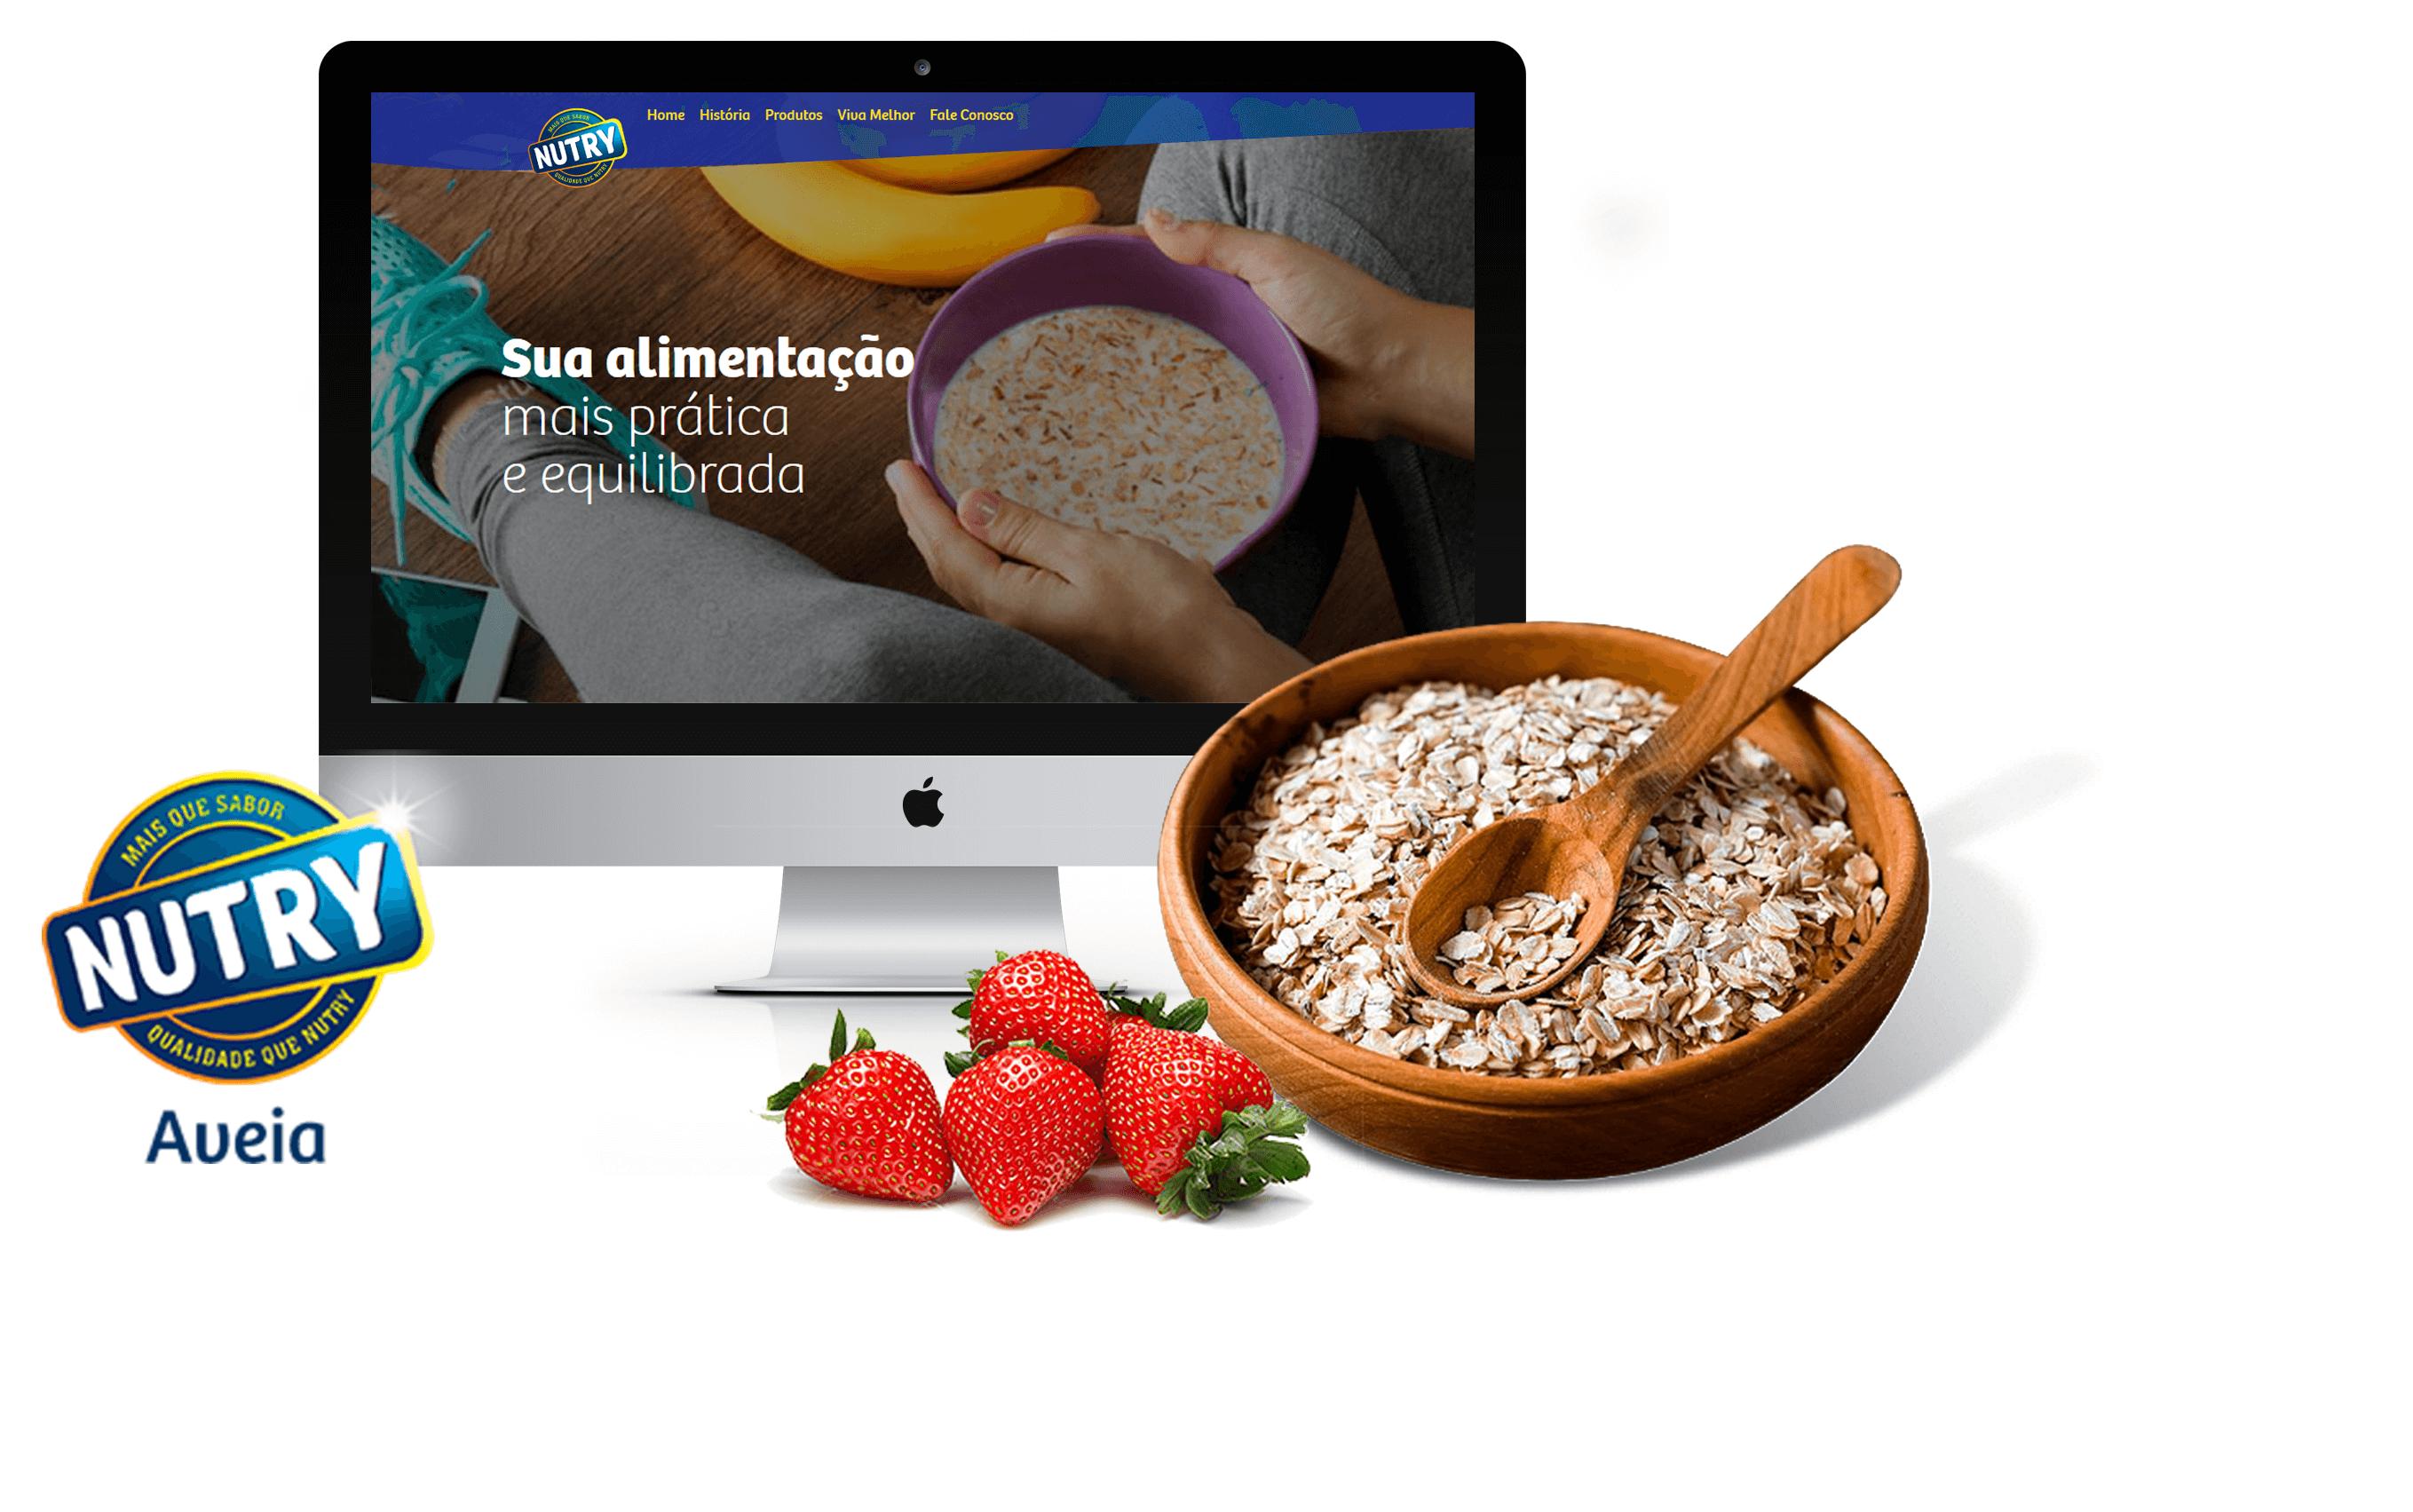 SITE NUTRY - AVEIA - PONTODESIGN